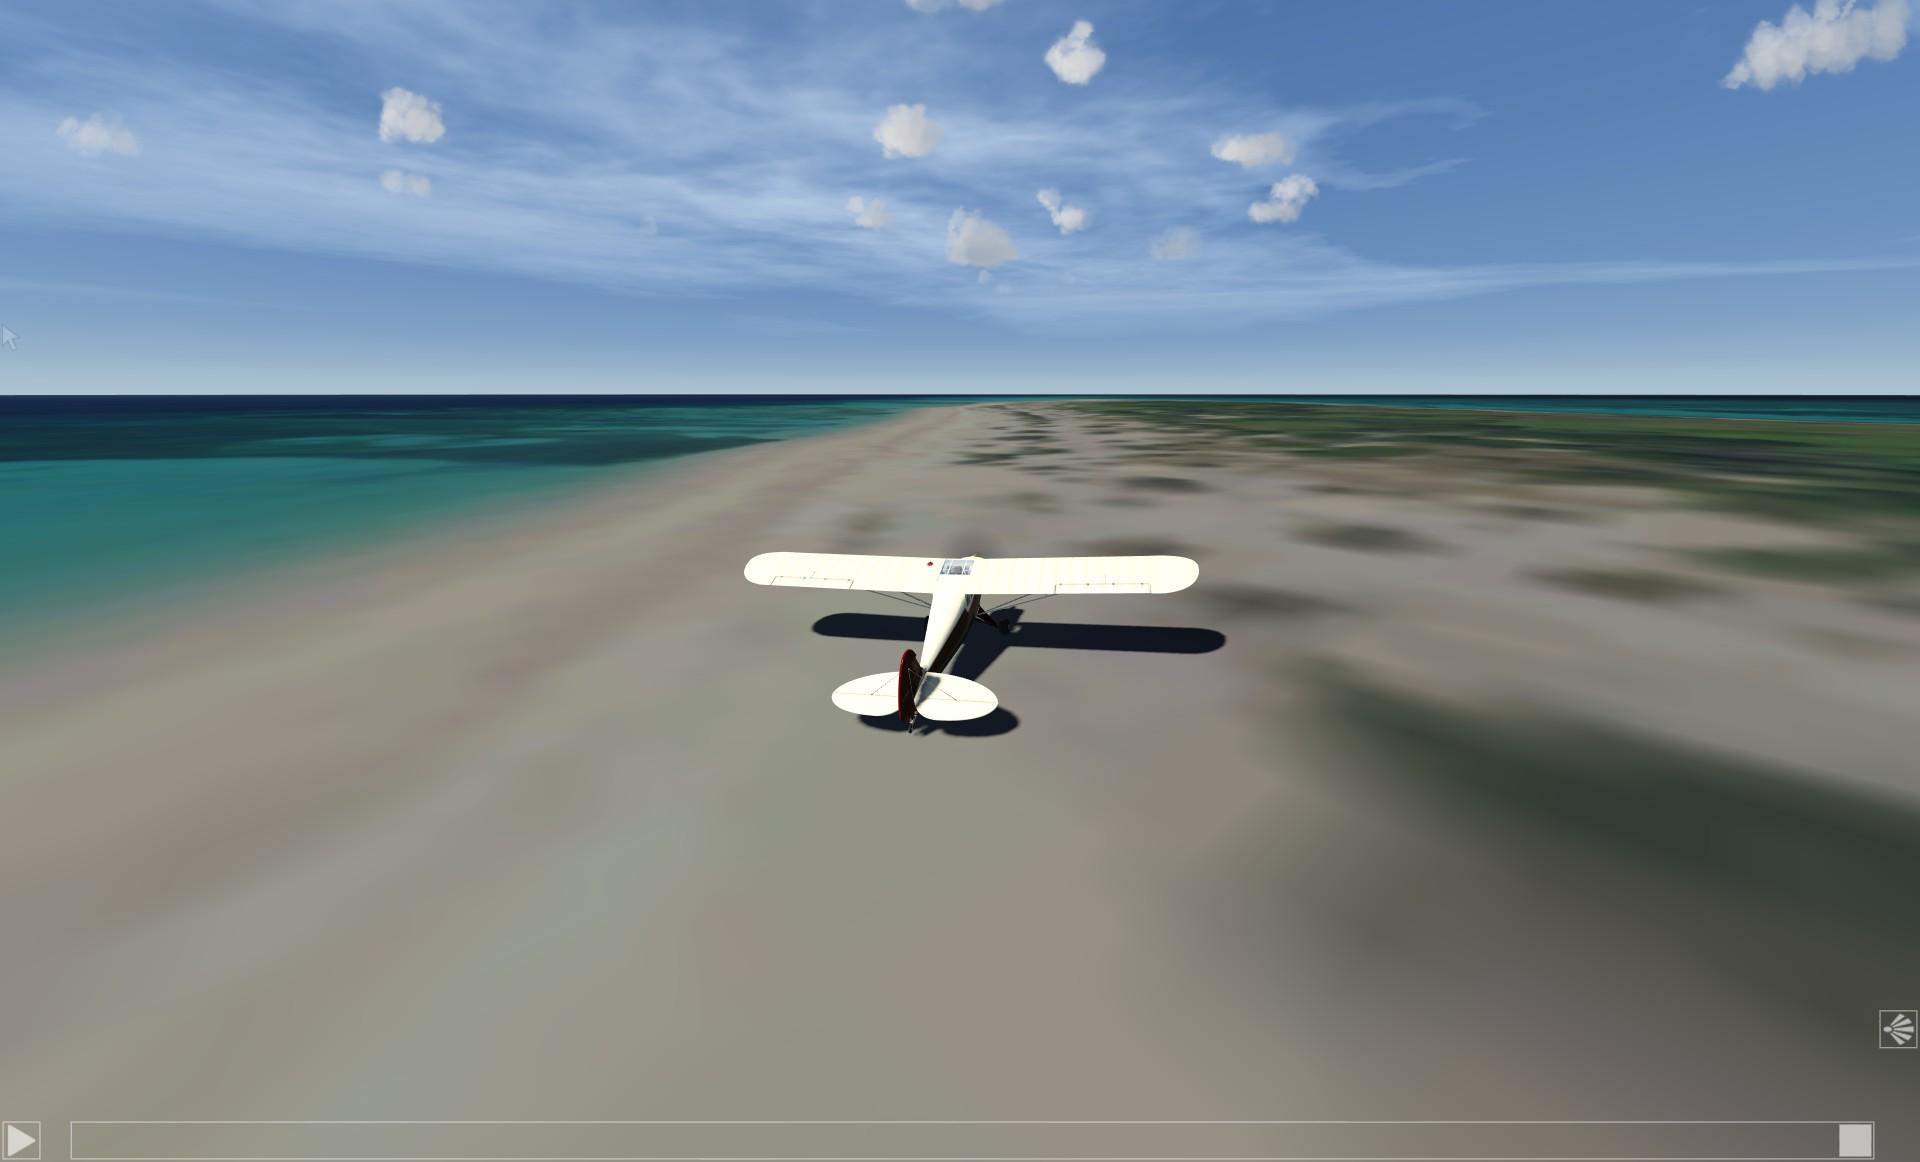 Posts by Jetjockey10 - Page 16 - IPACS Aerofly Forum